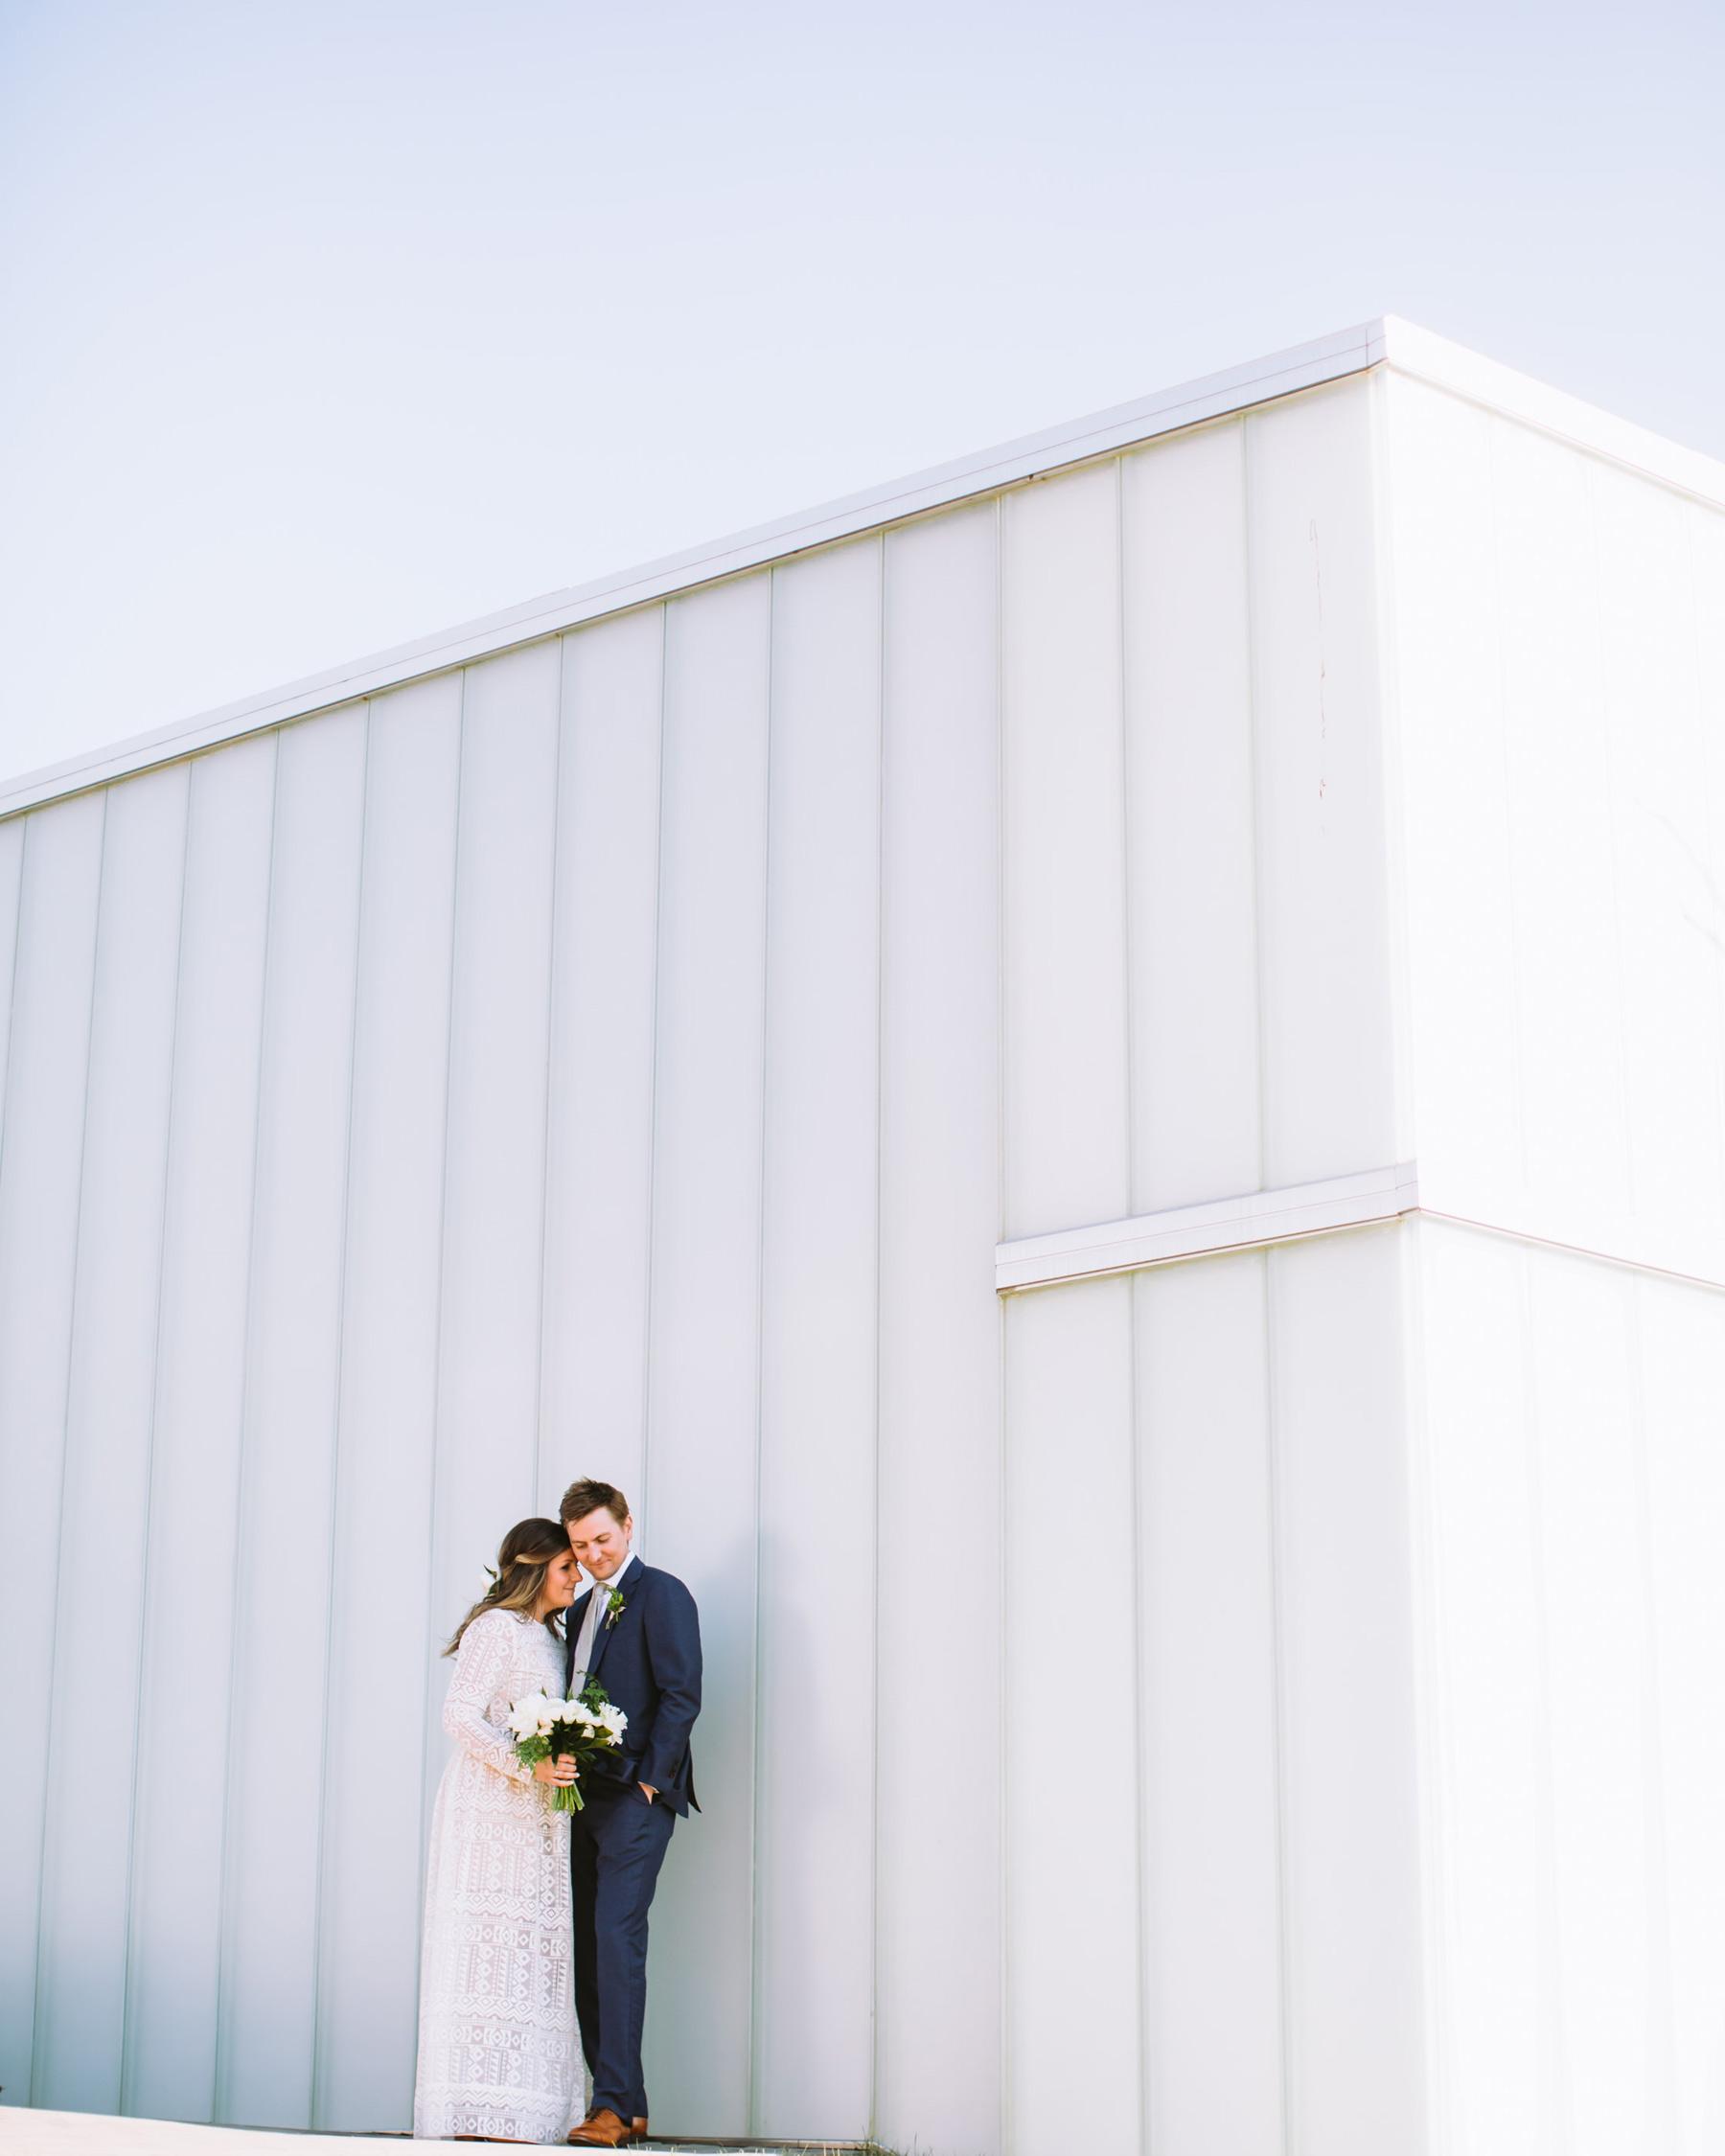 Pete + Susannah The Guild Kansas City Bohemian Outdoor Wedding _Kindling Wedding Photography - 27.JPG